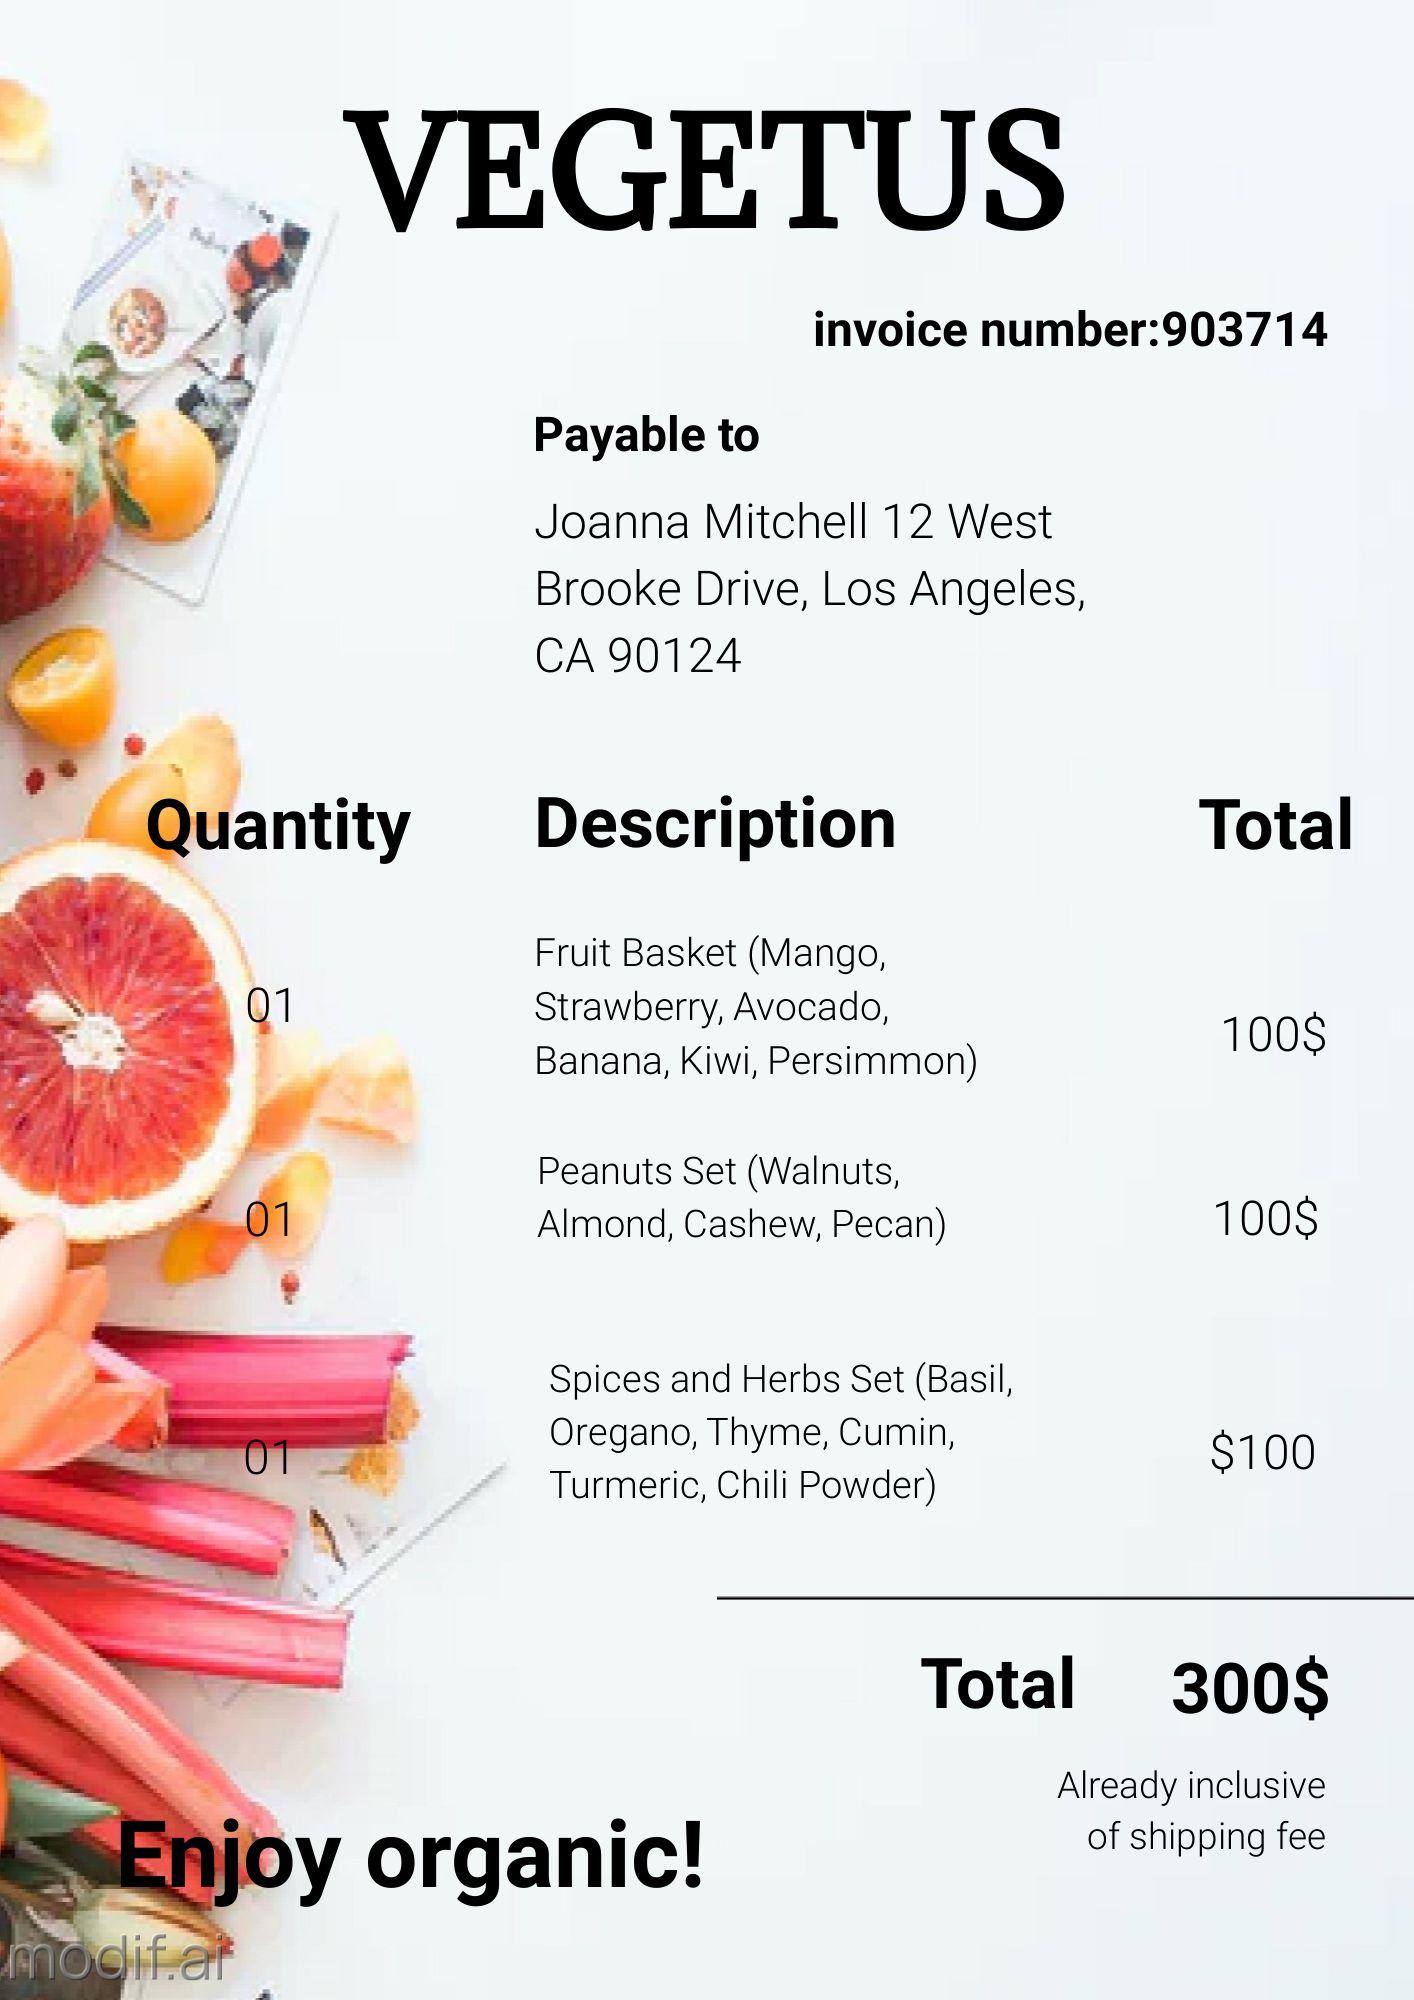 Invoice Organic Shop Template